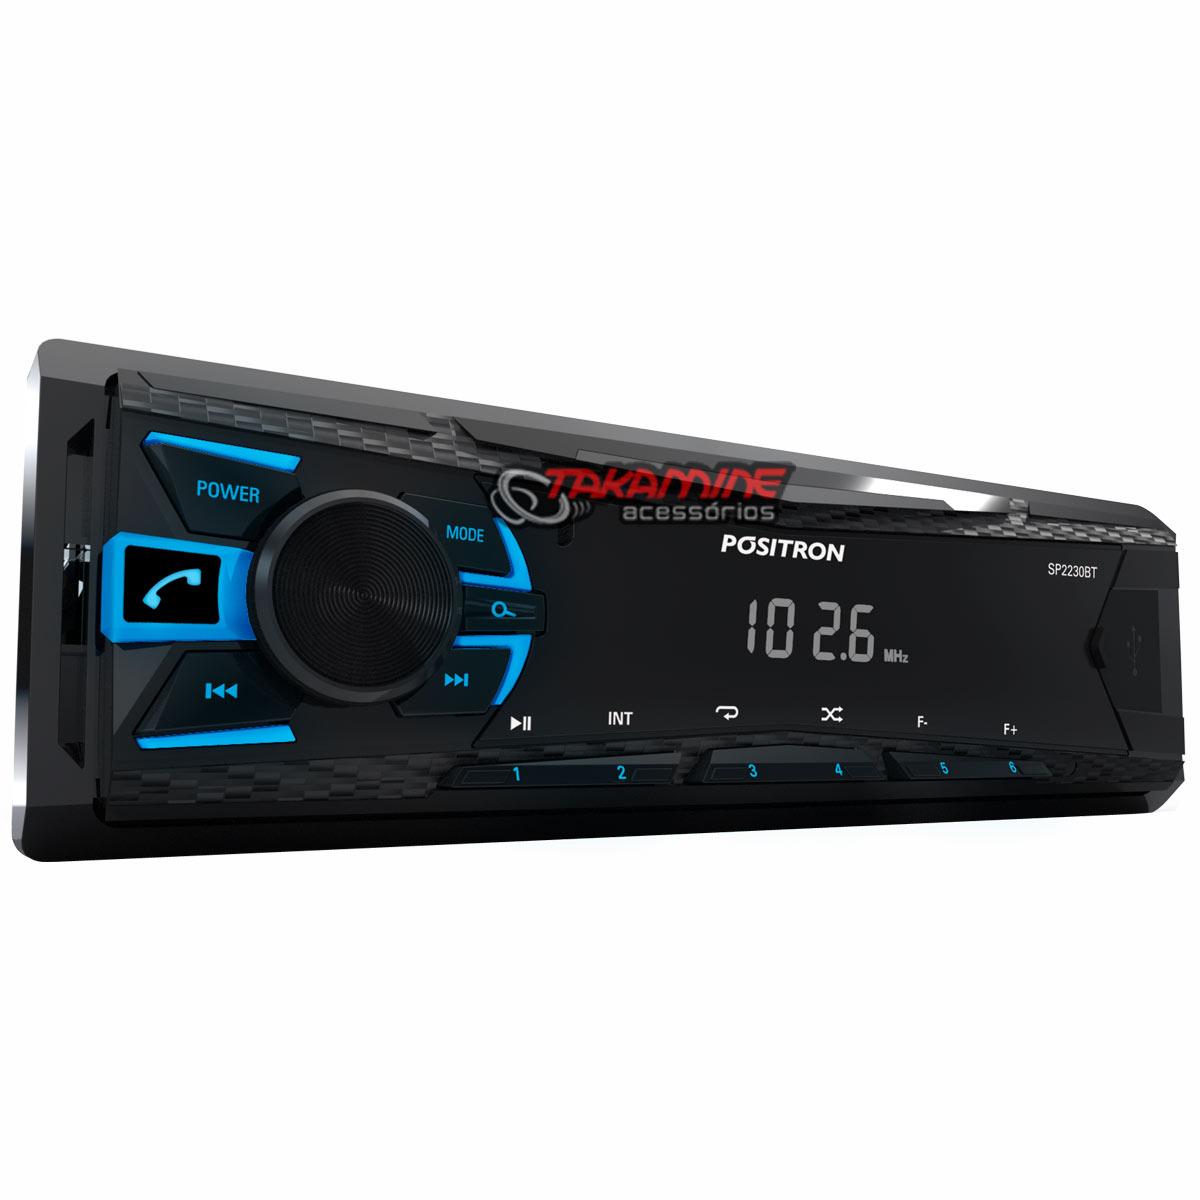 "Kit Som automotivo MP3 Positron + Par Falantes triaxiais JBL Selenium 6"""